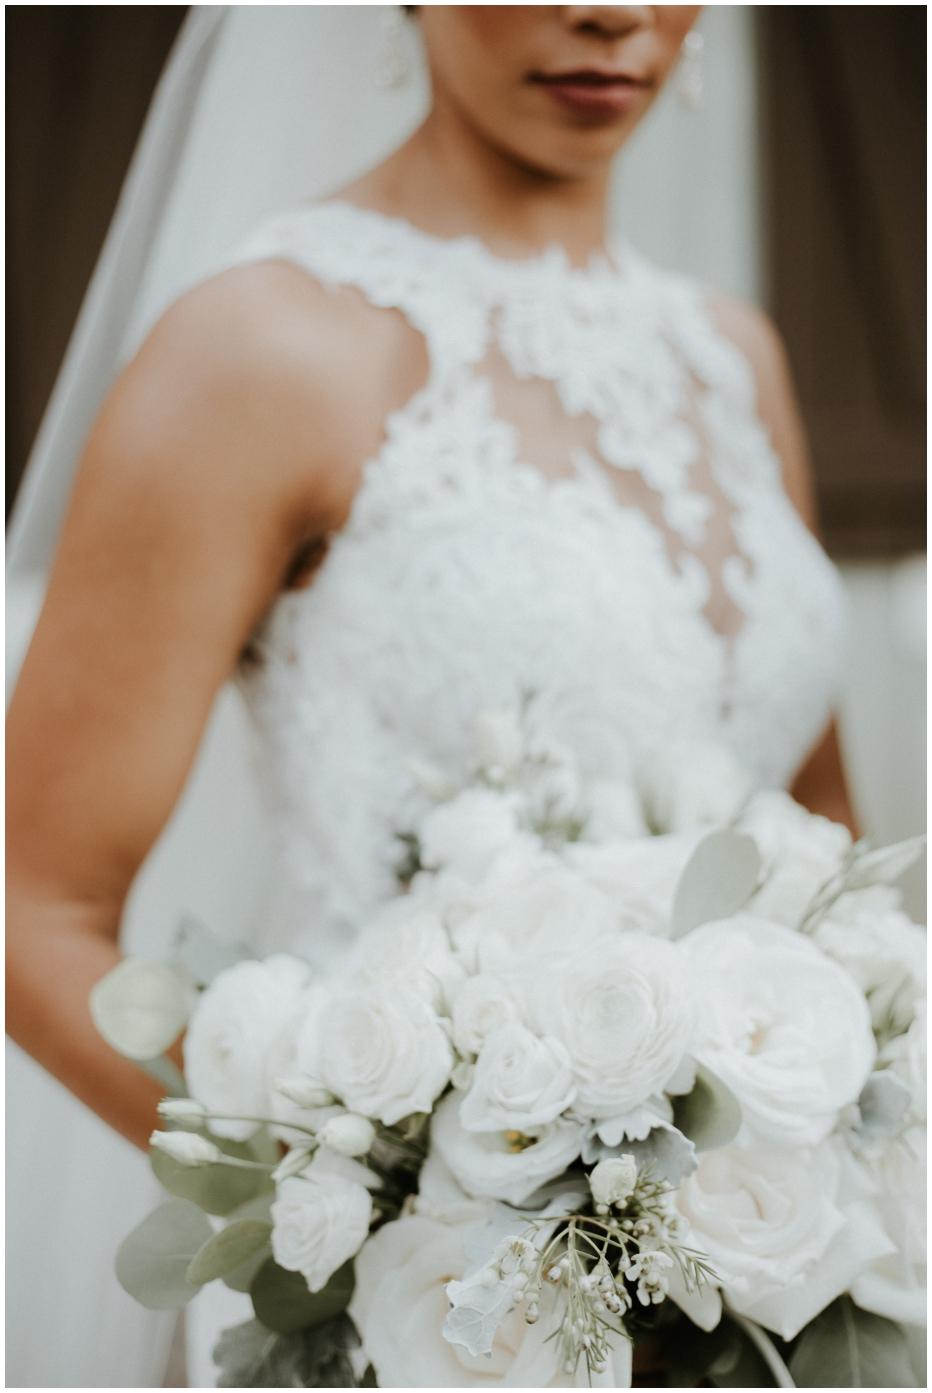 Posh-Moments-Photography-NC- Wedding-Photographer-Rolling-Hills-Farms-Wedding-Monroe-NC-Charlotte-NC_0262.jpg